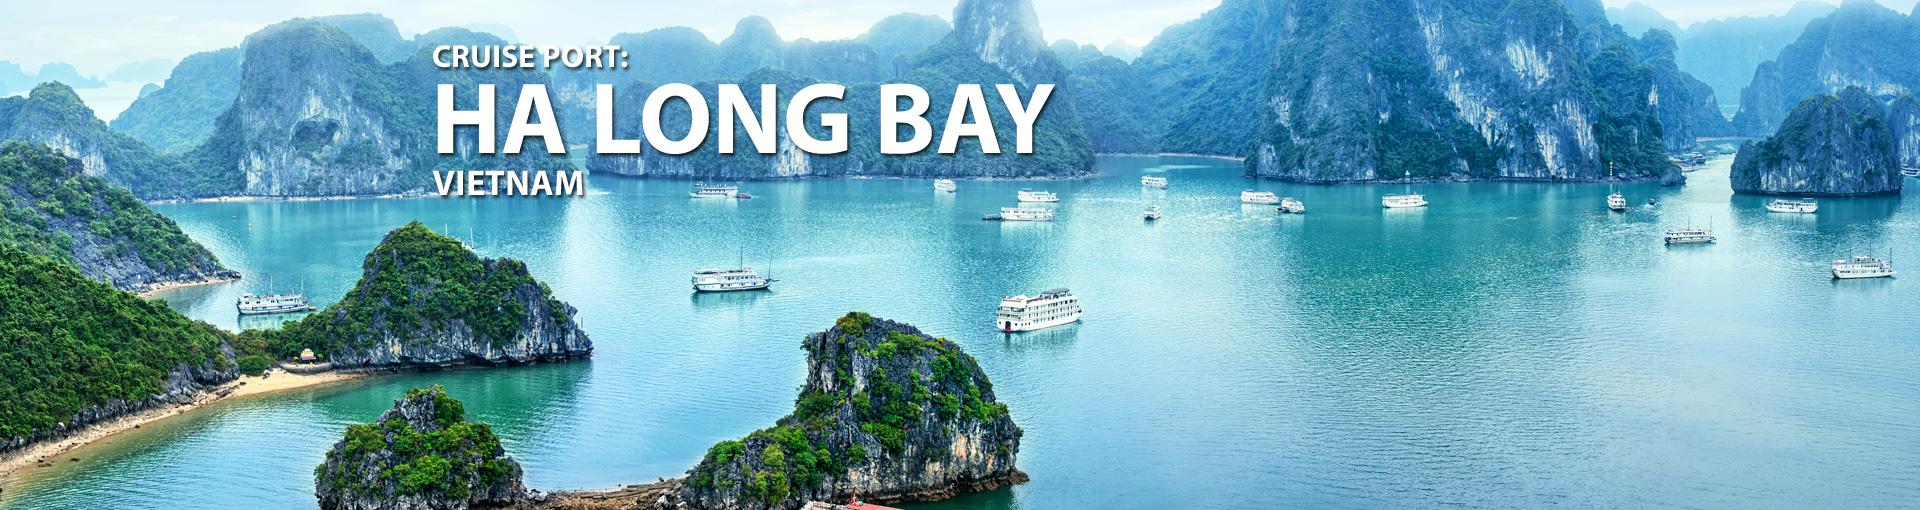 Cruises to Ha Long Bay, Vietnam